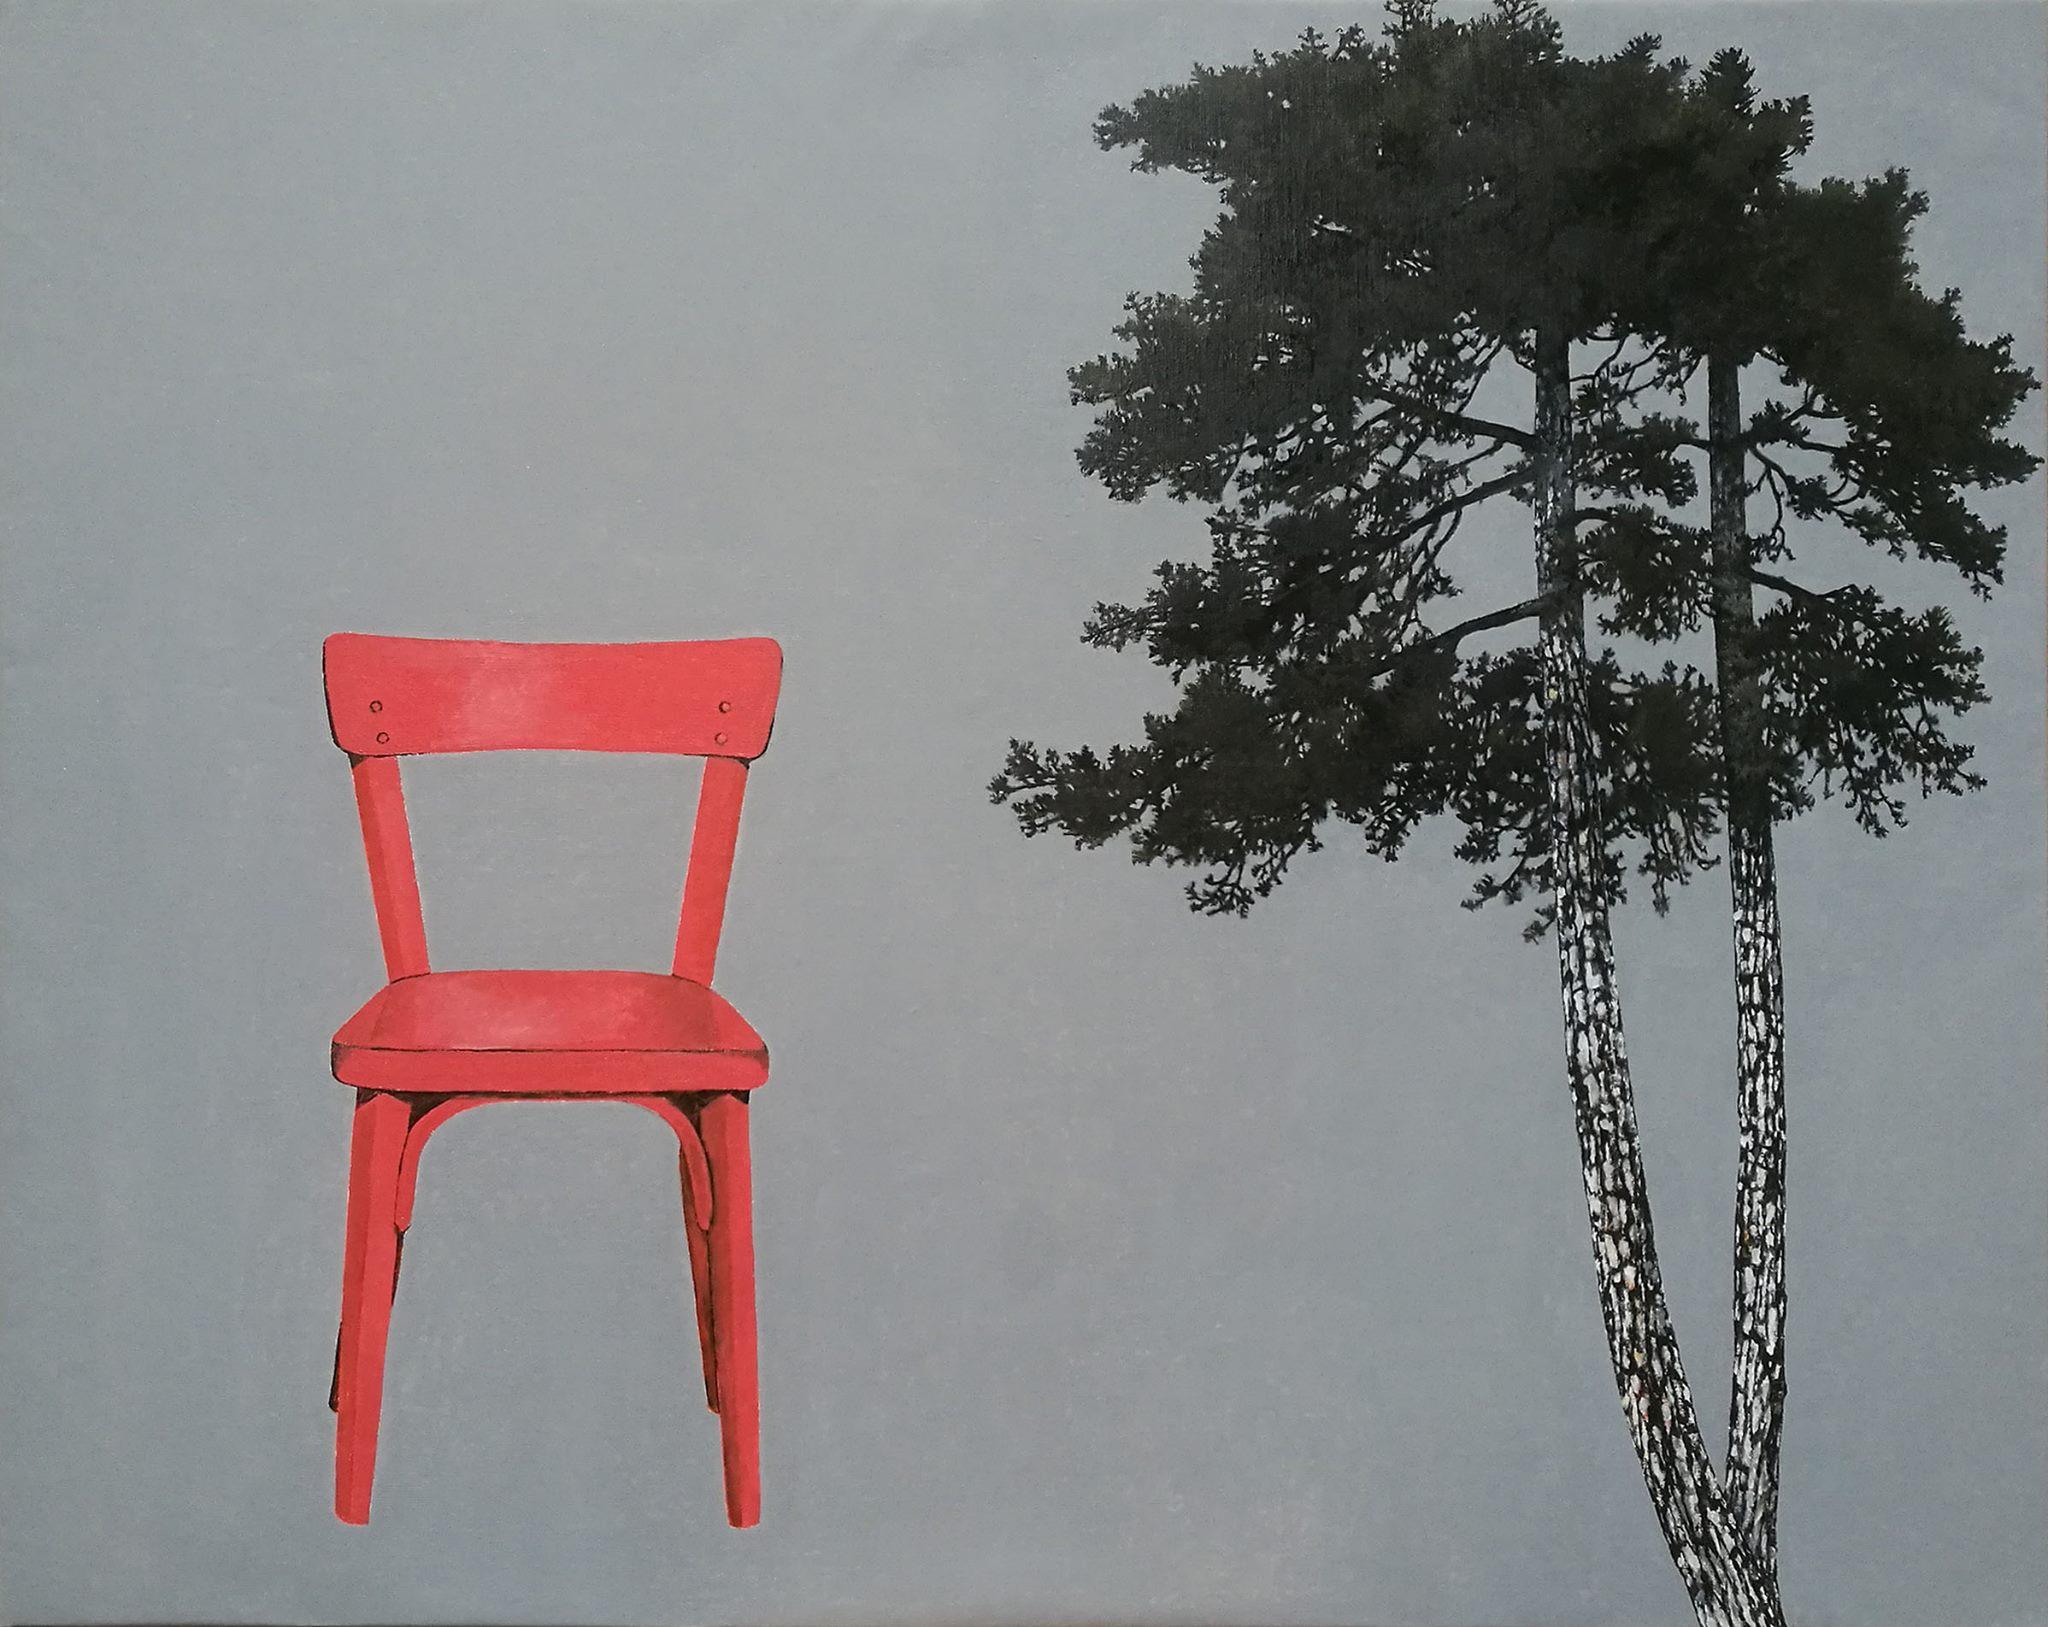 IKIOU - Chaise orange, Huile sur toile, 100x81cm